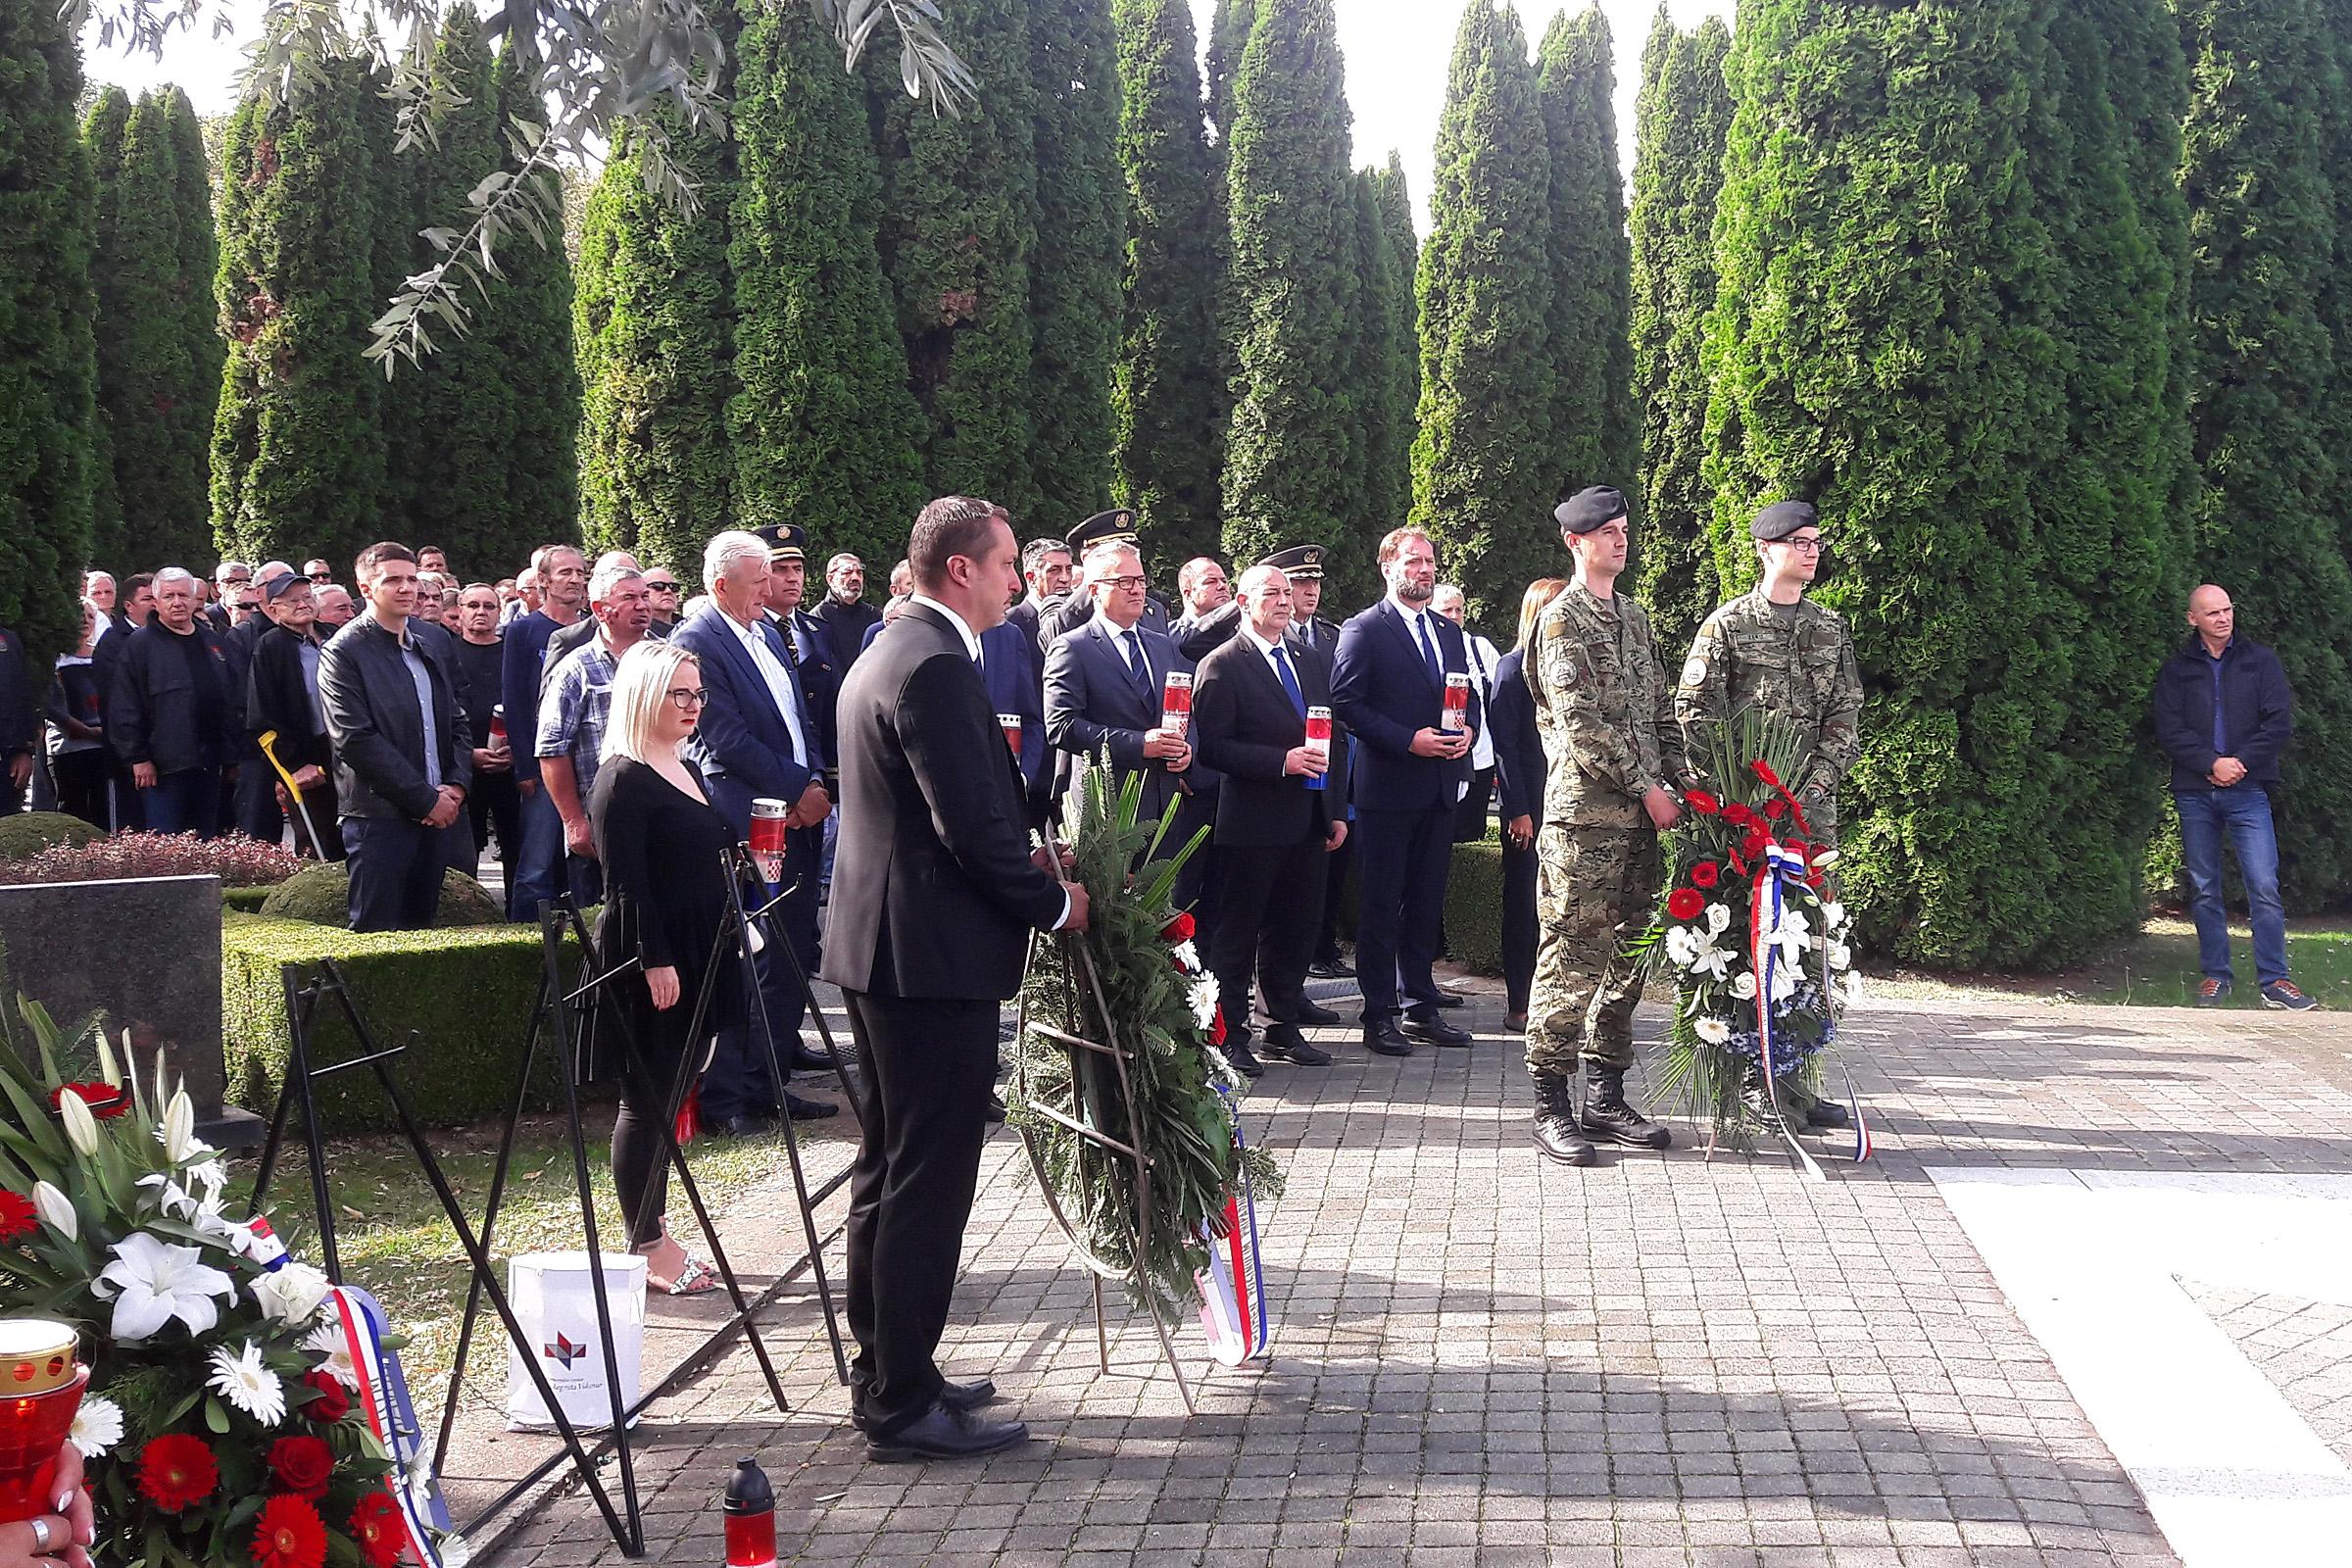 Ministar Banožić na obilježavanju 29. obljetnice osnutka 204. vukovarske brigade